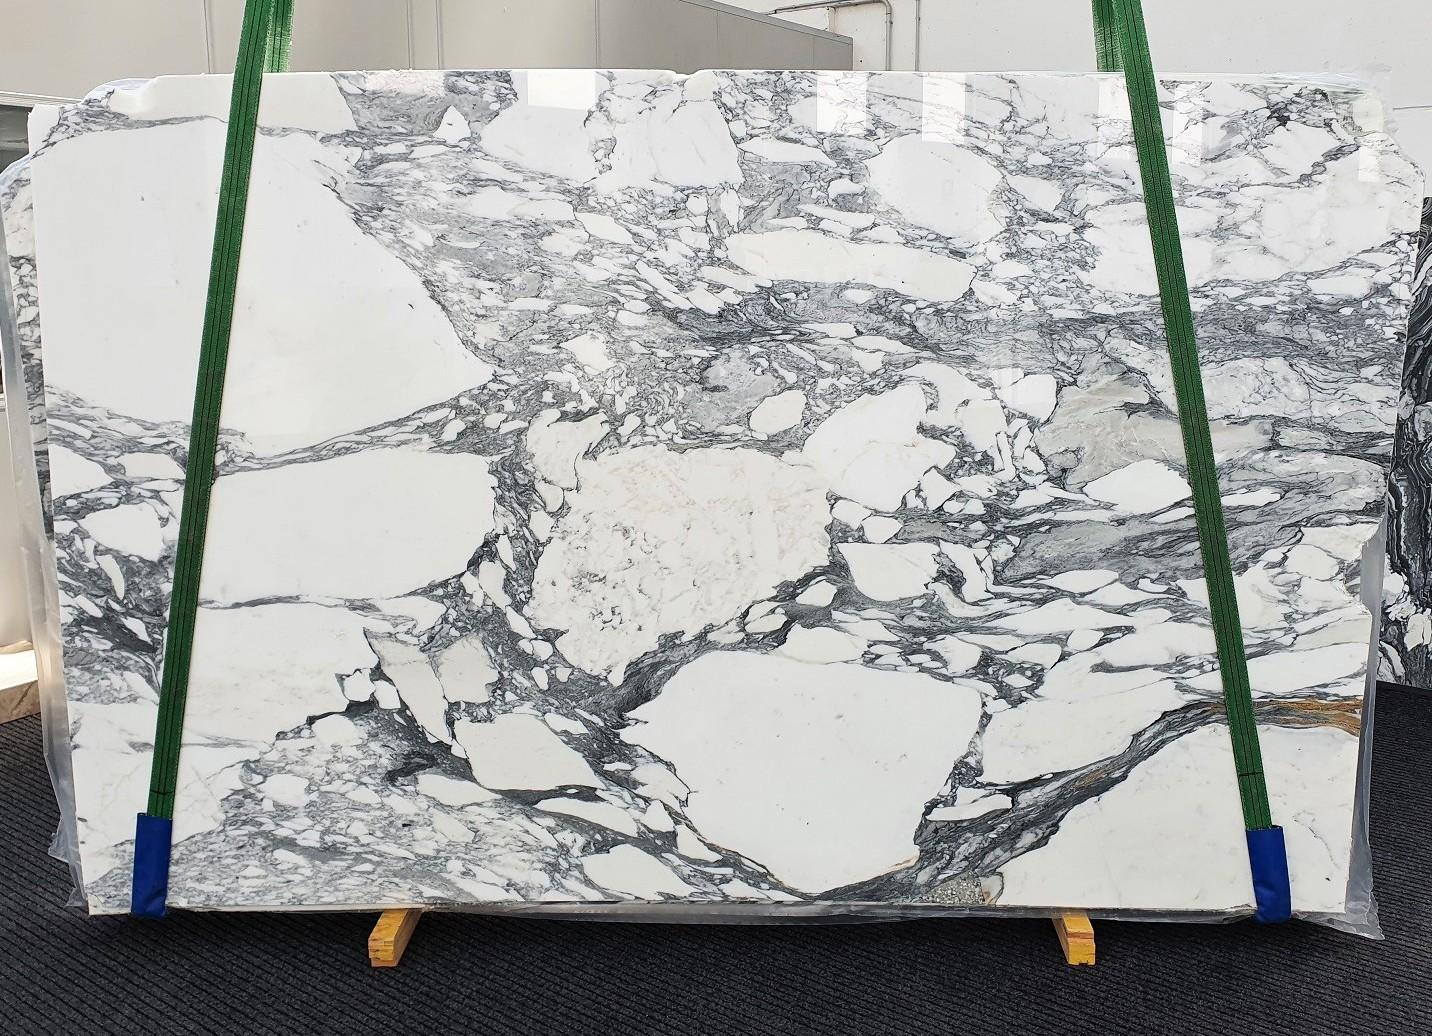 ARABESCATO CORCHIA Supply Veneto (Italy) polished slabs 1433 , Slab #01 natural marble